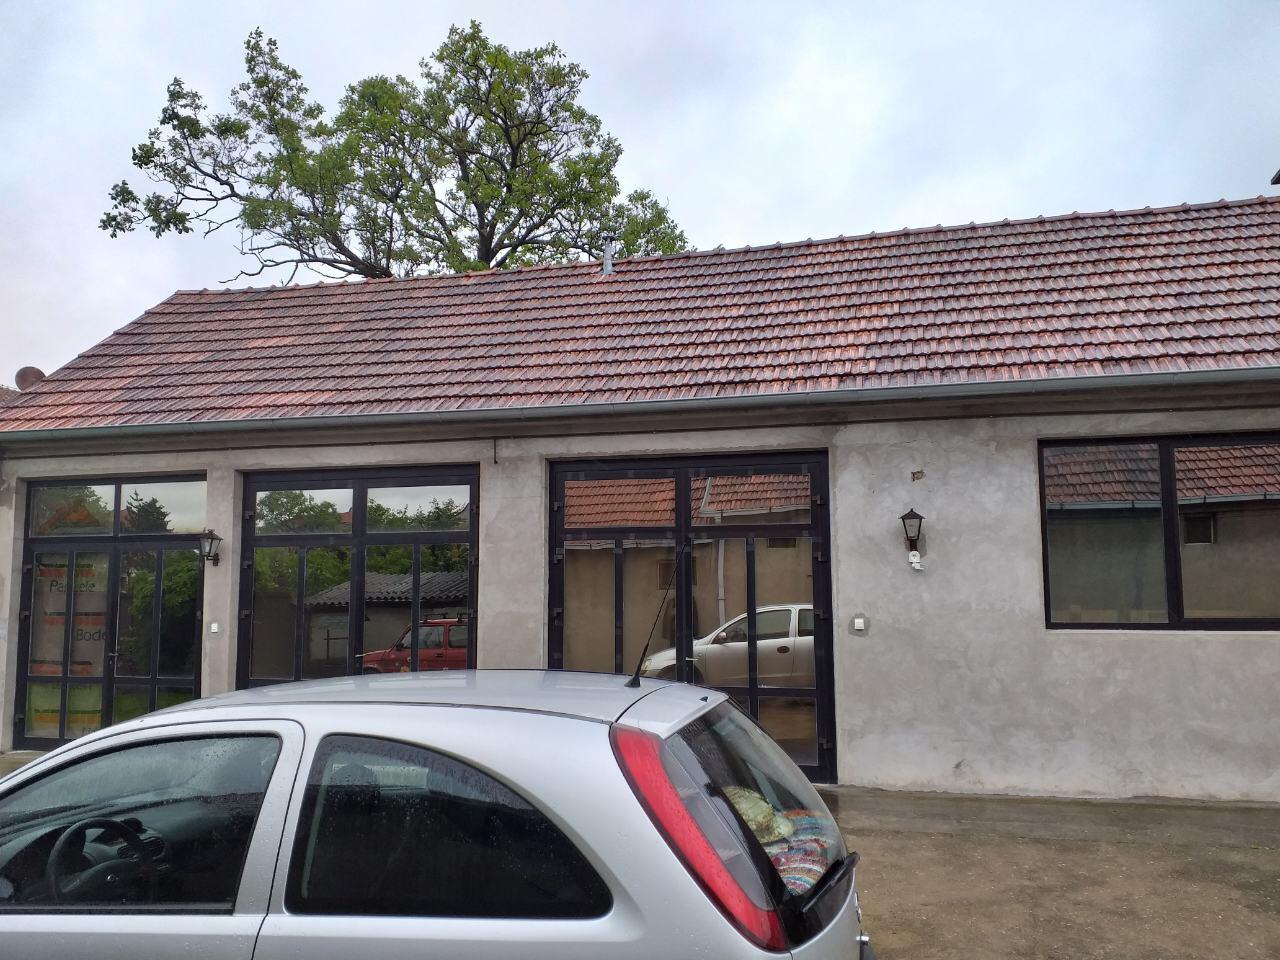 Kuća 340 m2, posl. prostor 150 m2, plac 1717 m2, Inđija